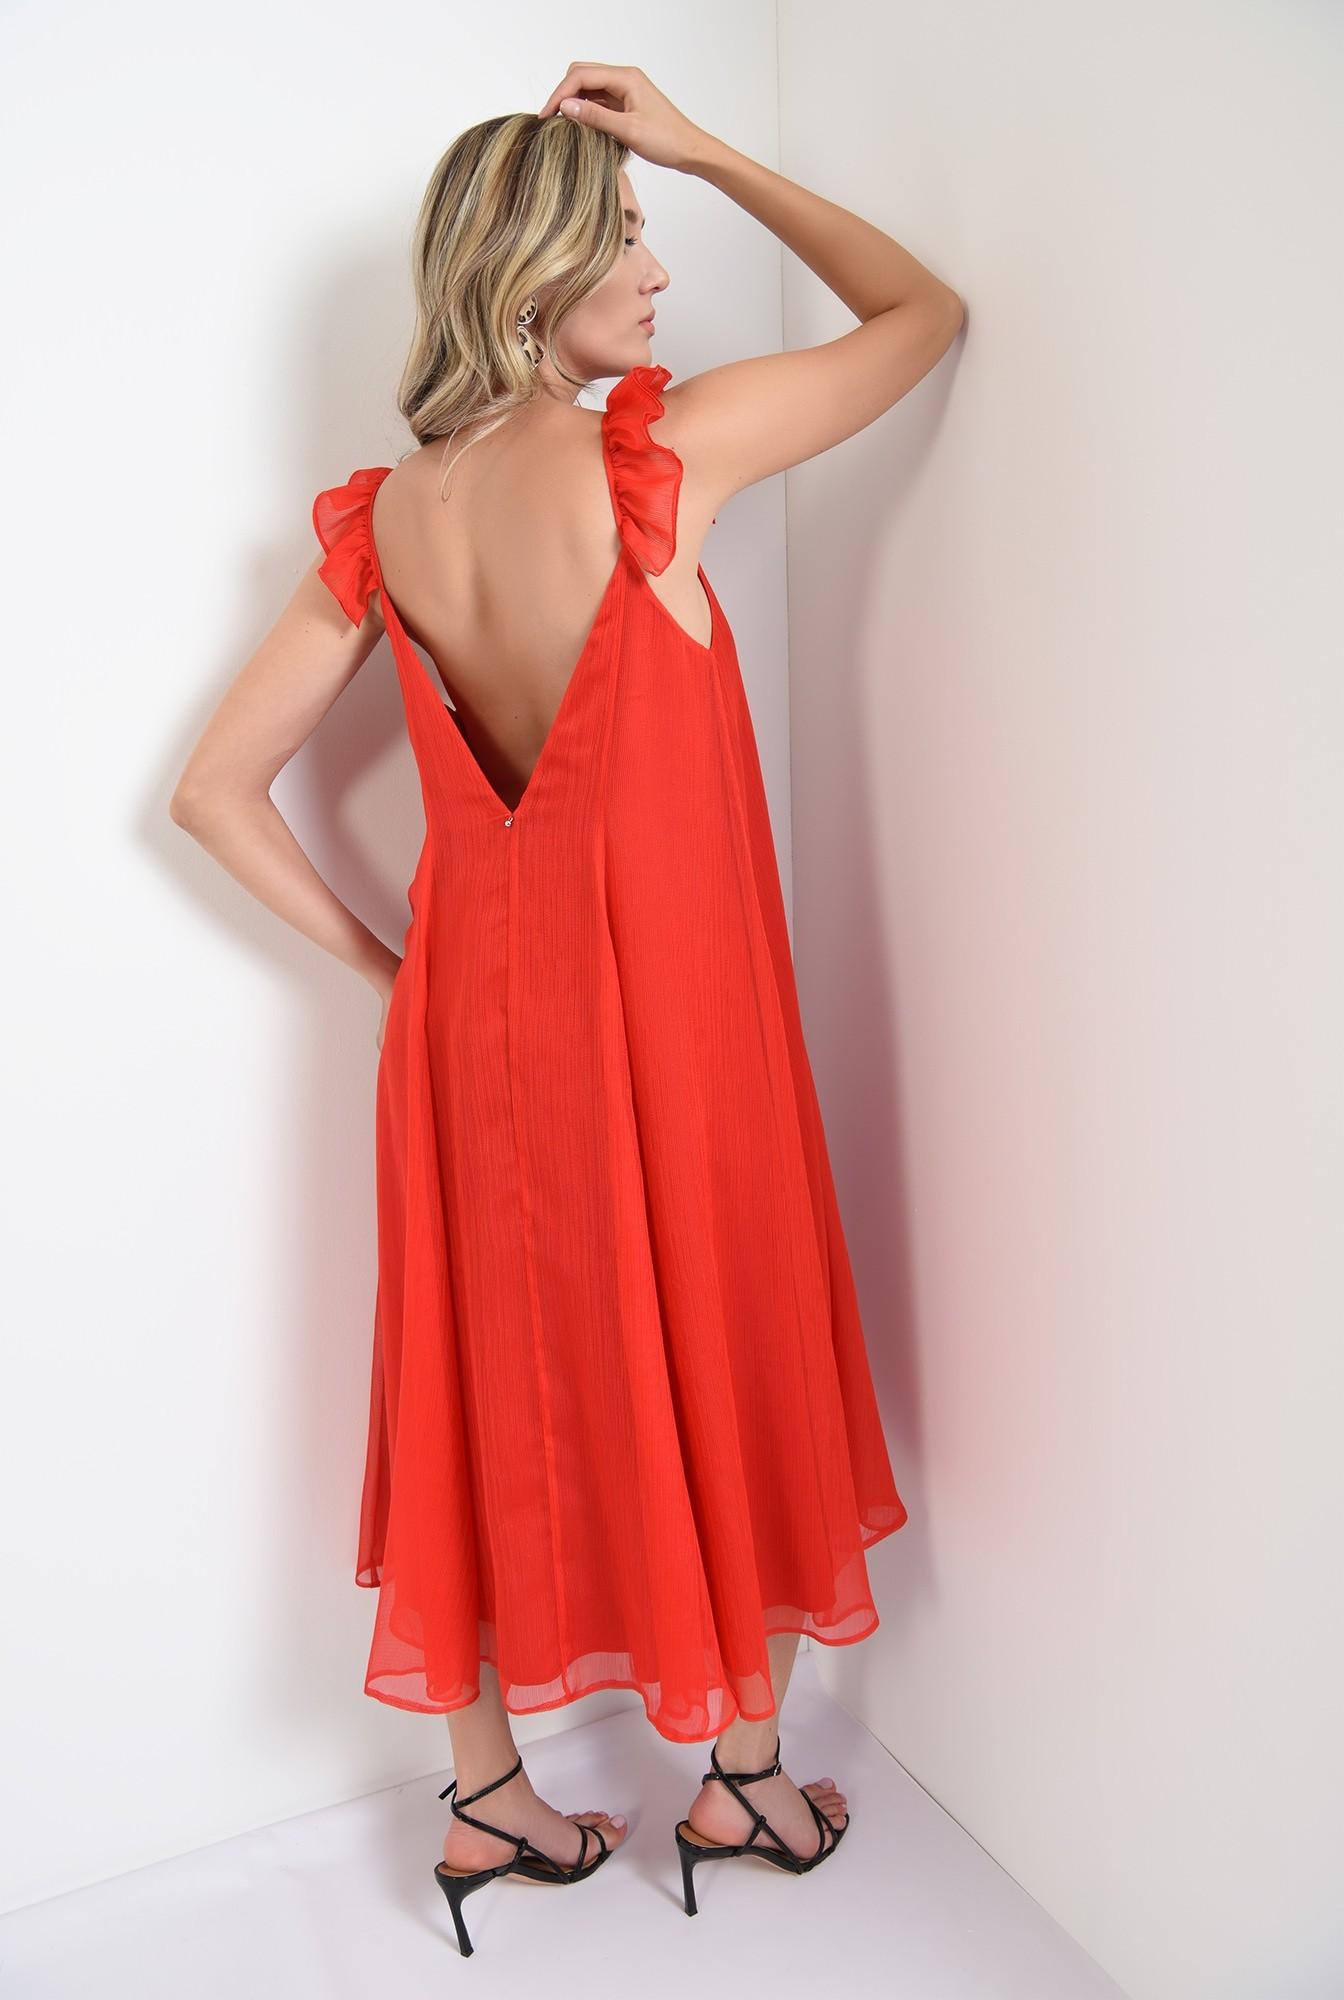 1 - 360 - rochie rosie,midi, tip furou, Poema